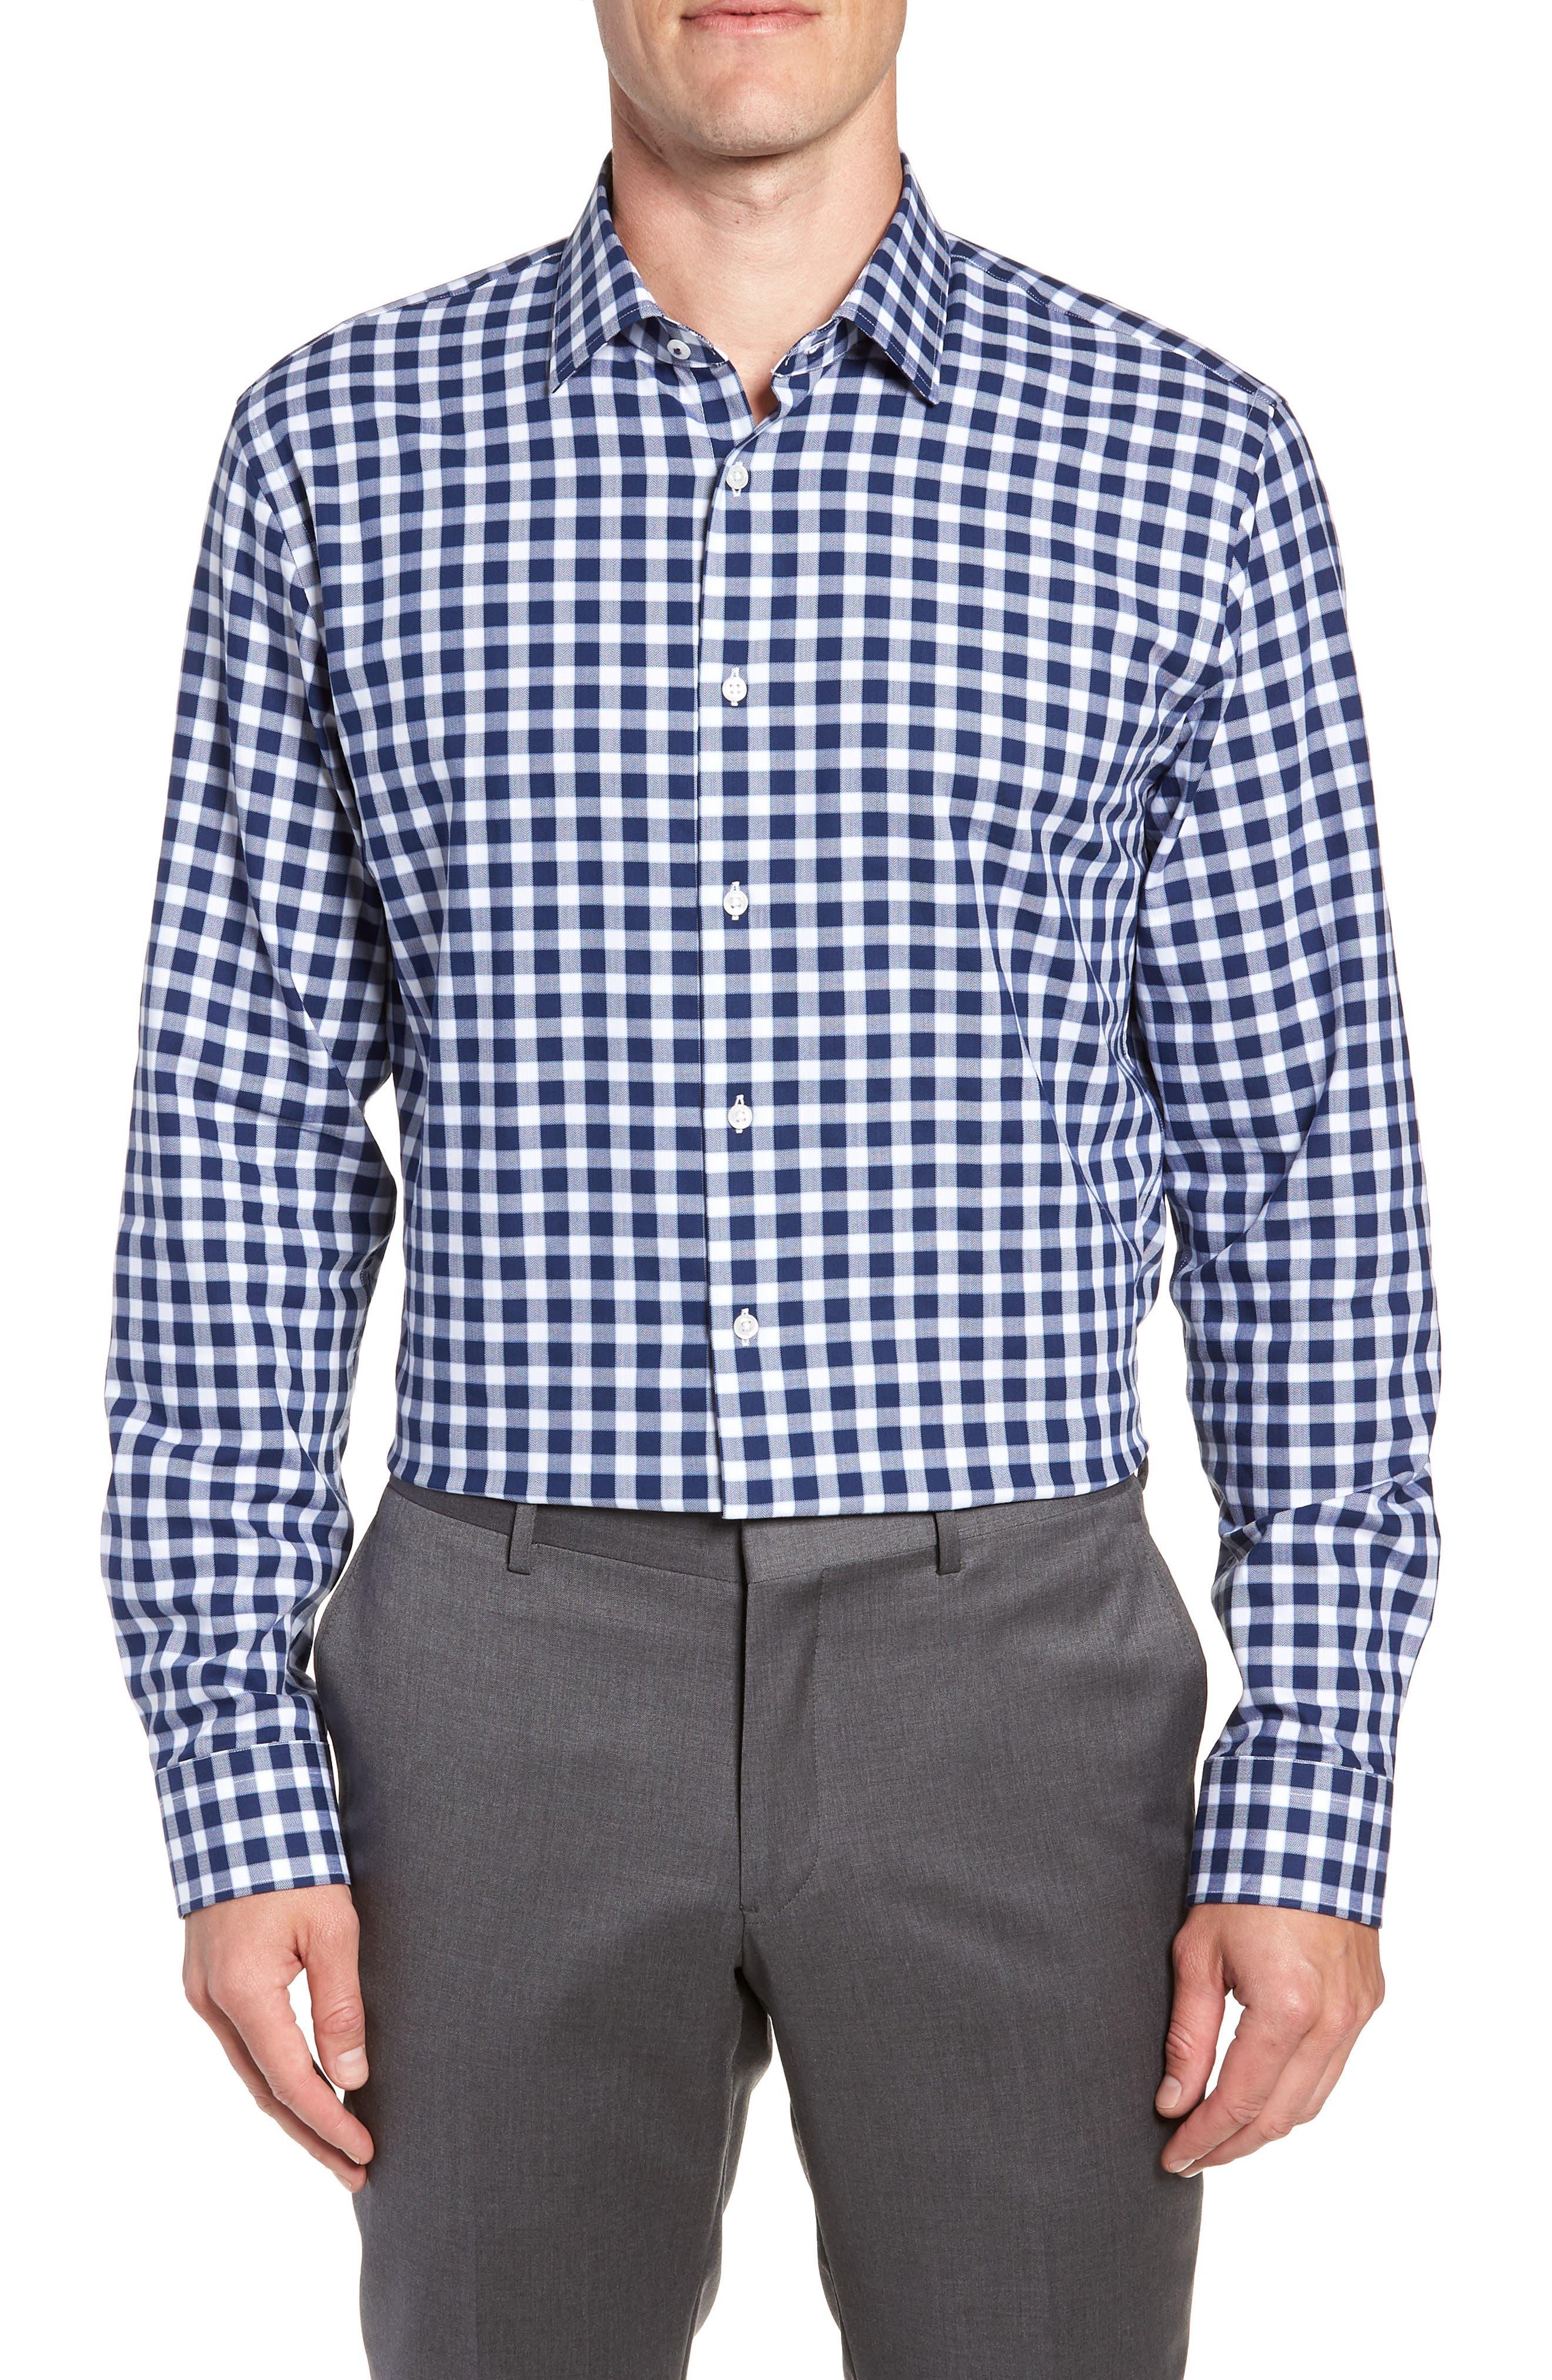 Tech-Smart Trim Fit Stretch Check Dress Shirt,                         Main,                         color, NAVY PEACOAT